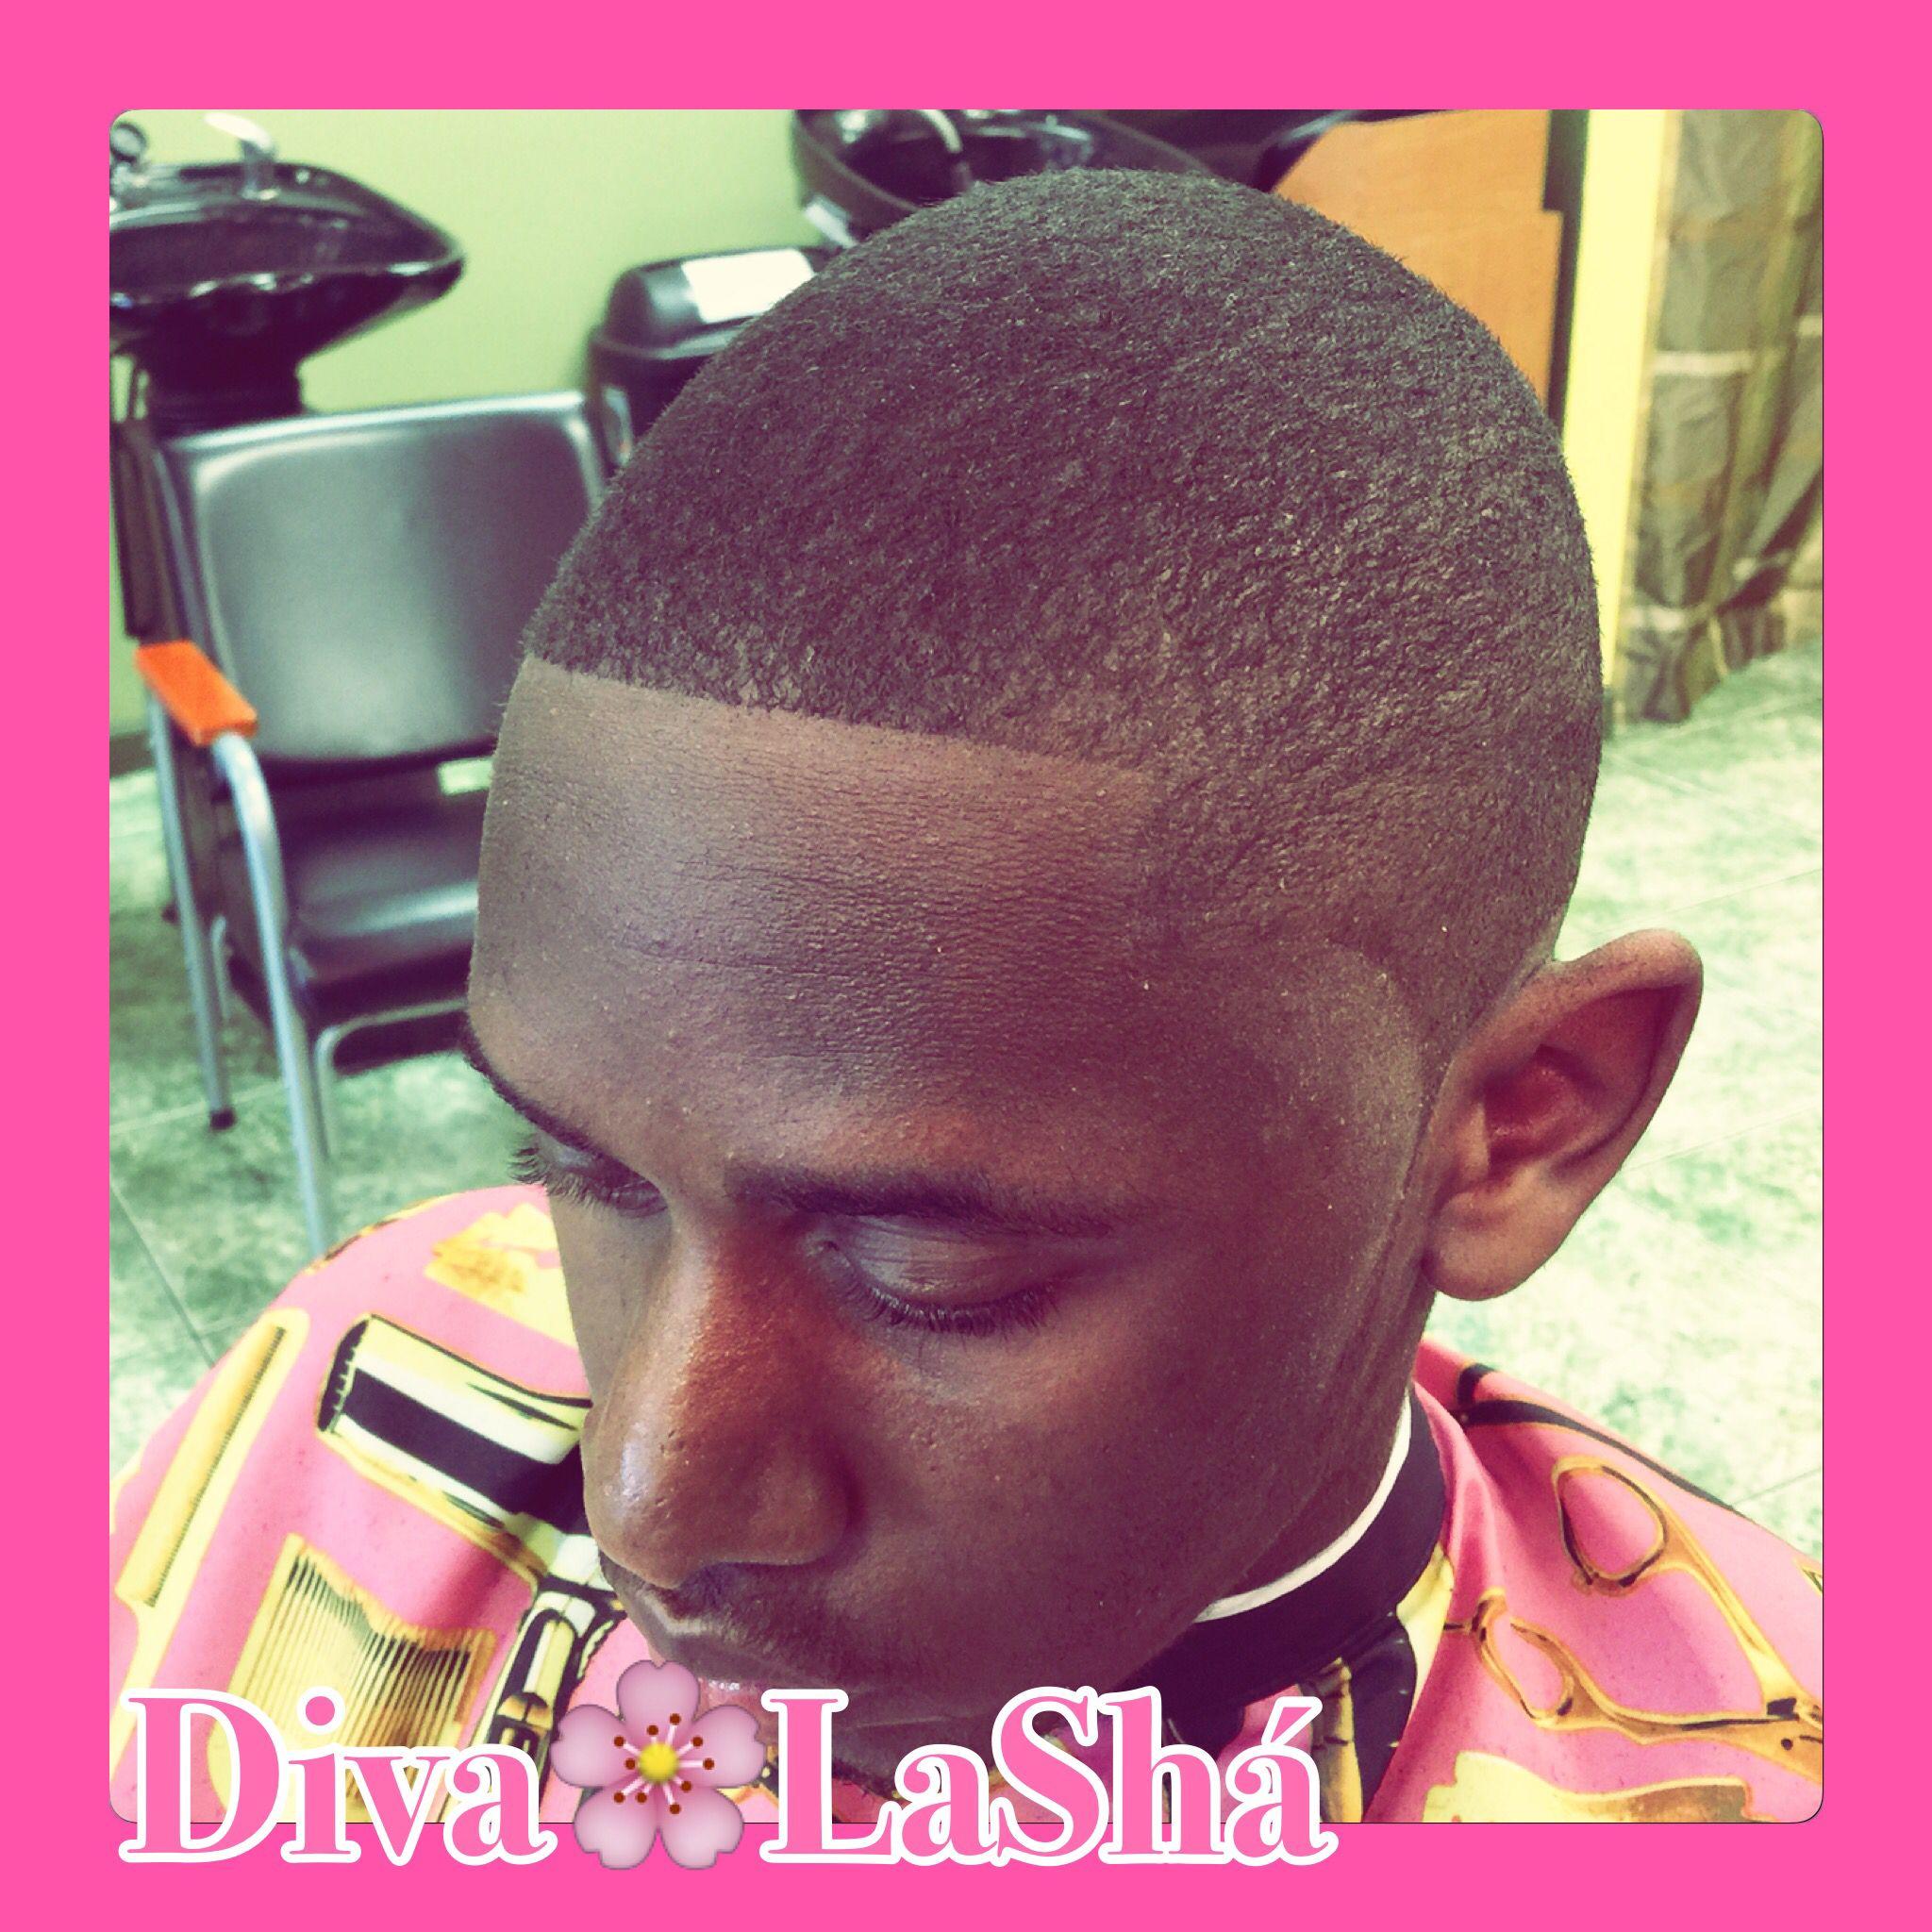 Tape Up Line Up Haircuts Fresh Cuts Divine Female Barber